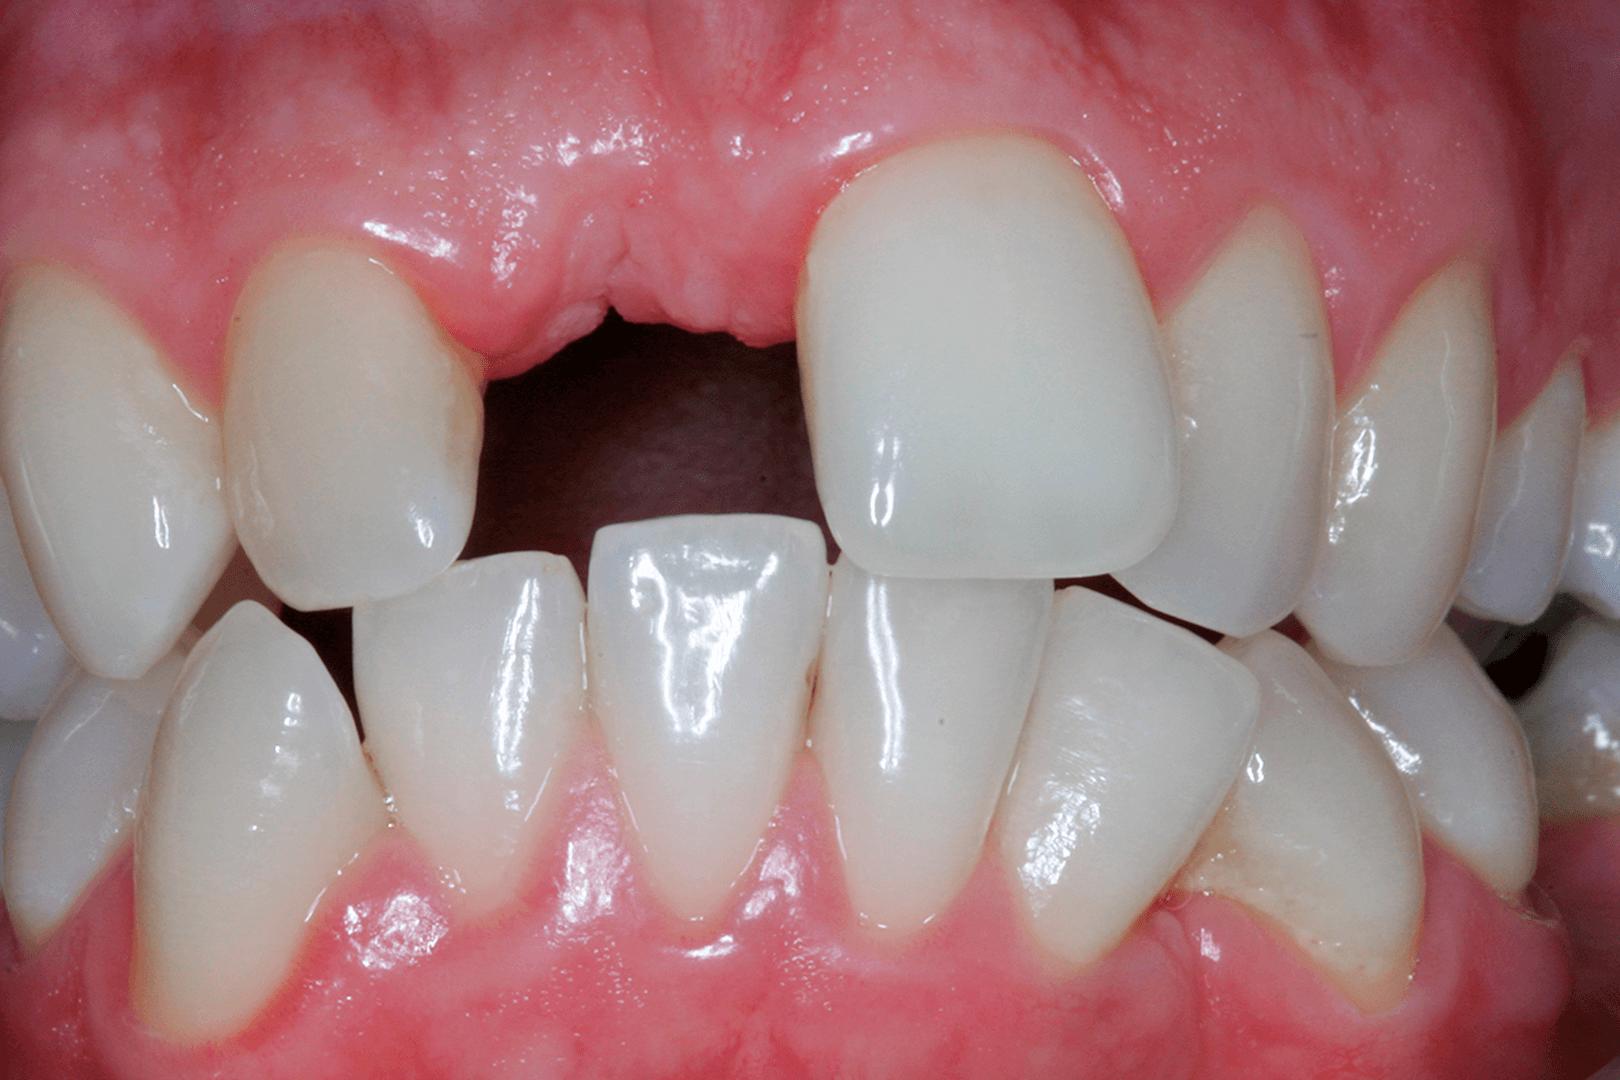 Clinica Pinheiro Torres - Perda parcial de massa óssea vestibular